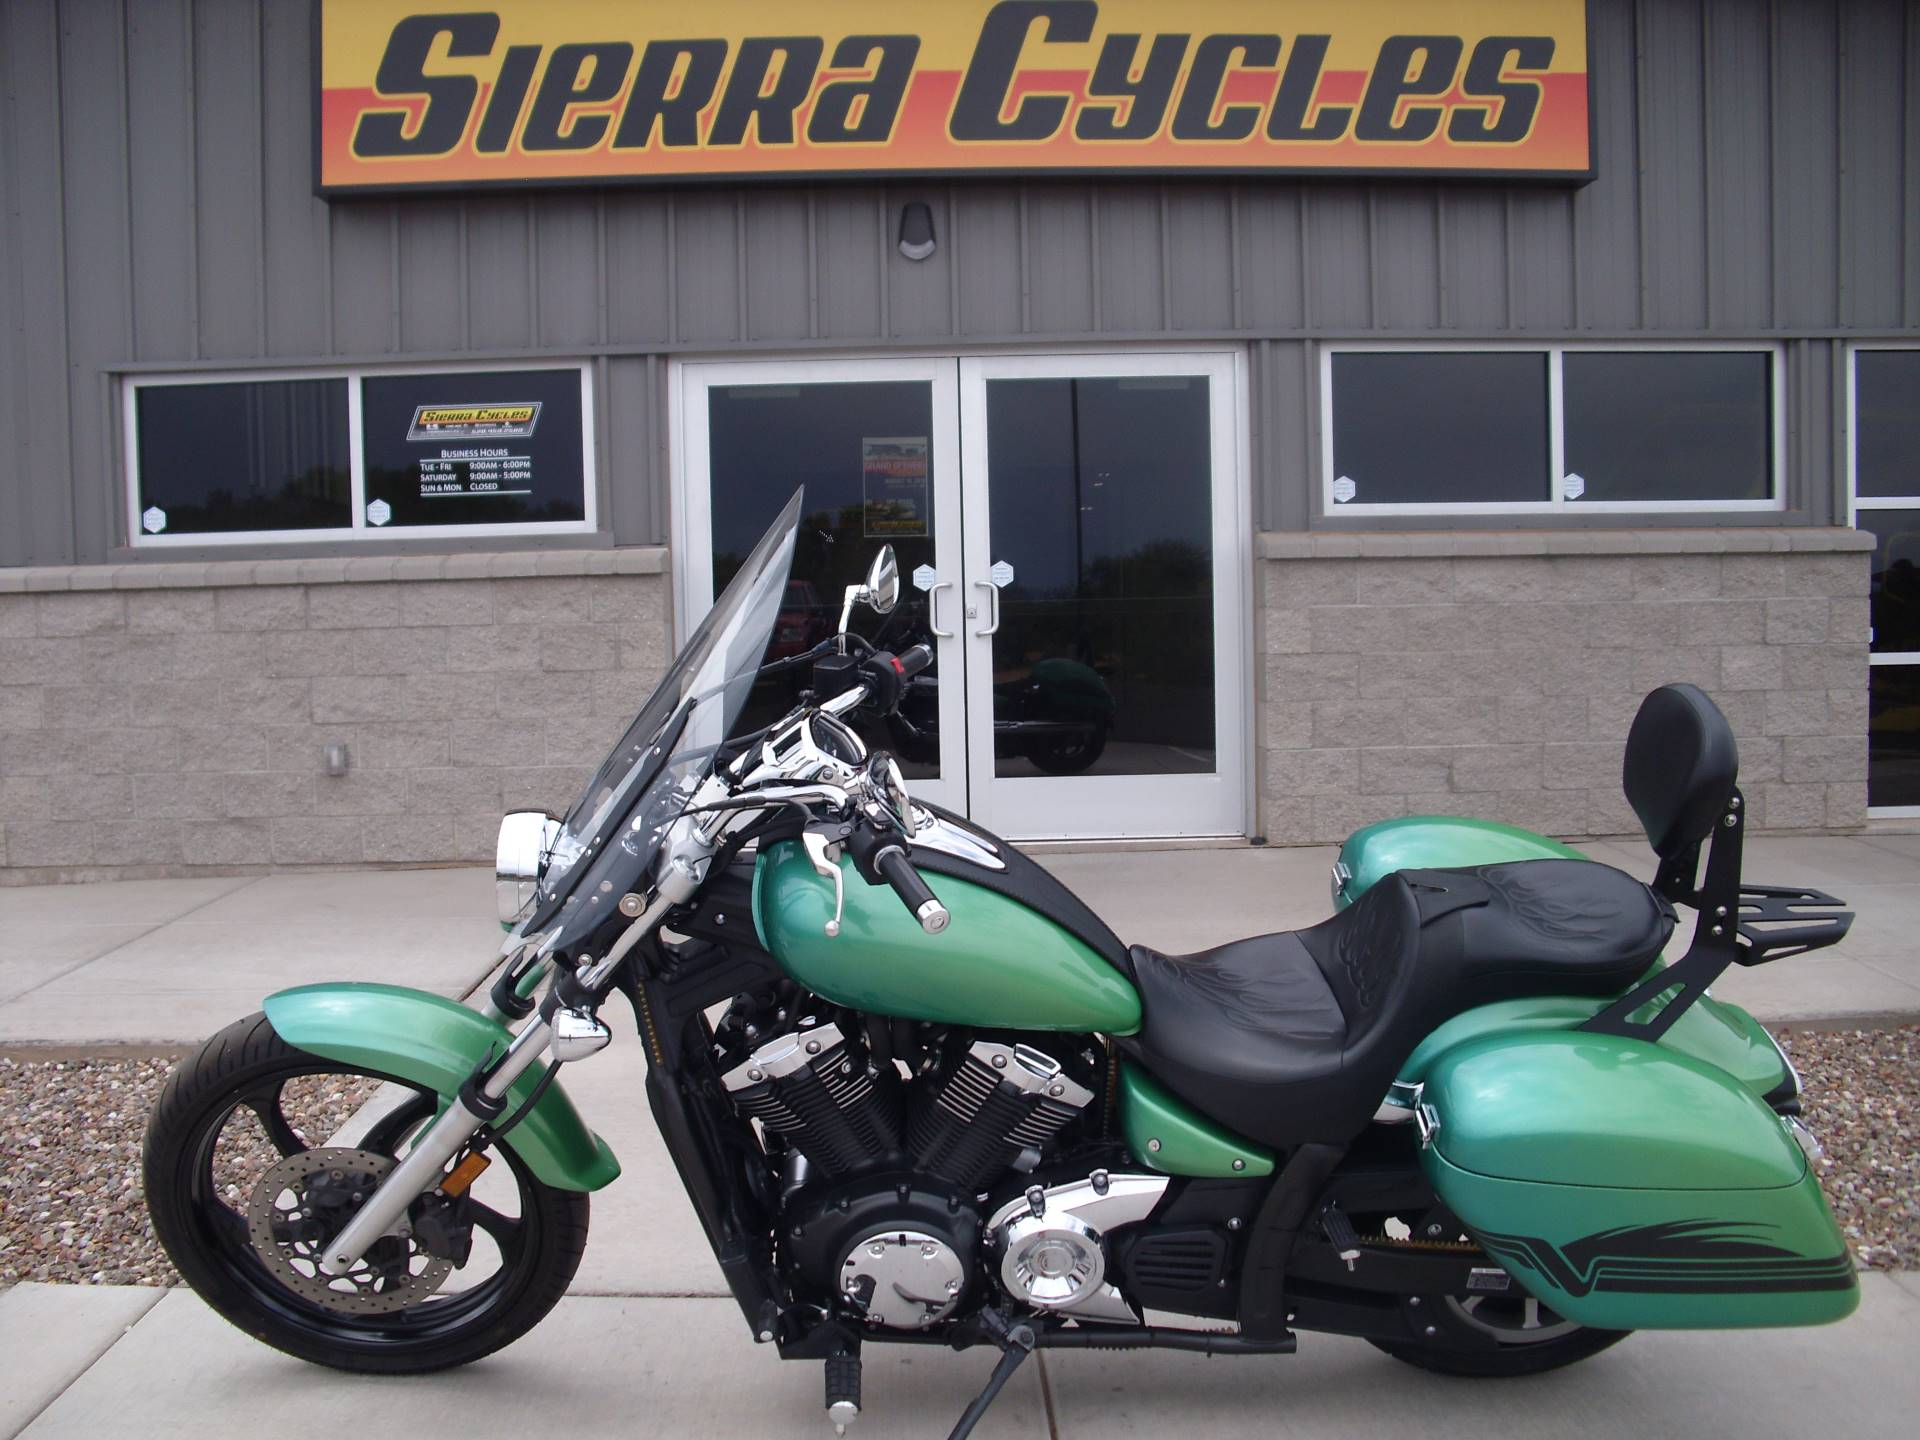 2011 Yamaha Stryker for sale 85486